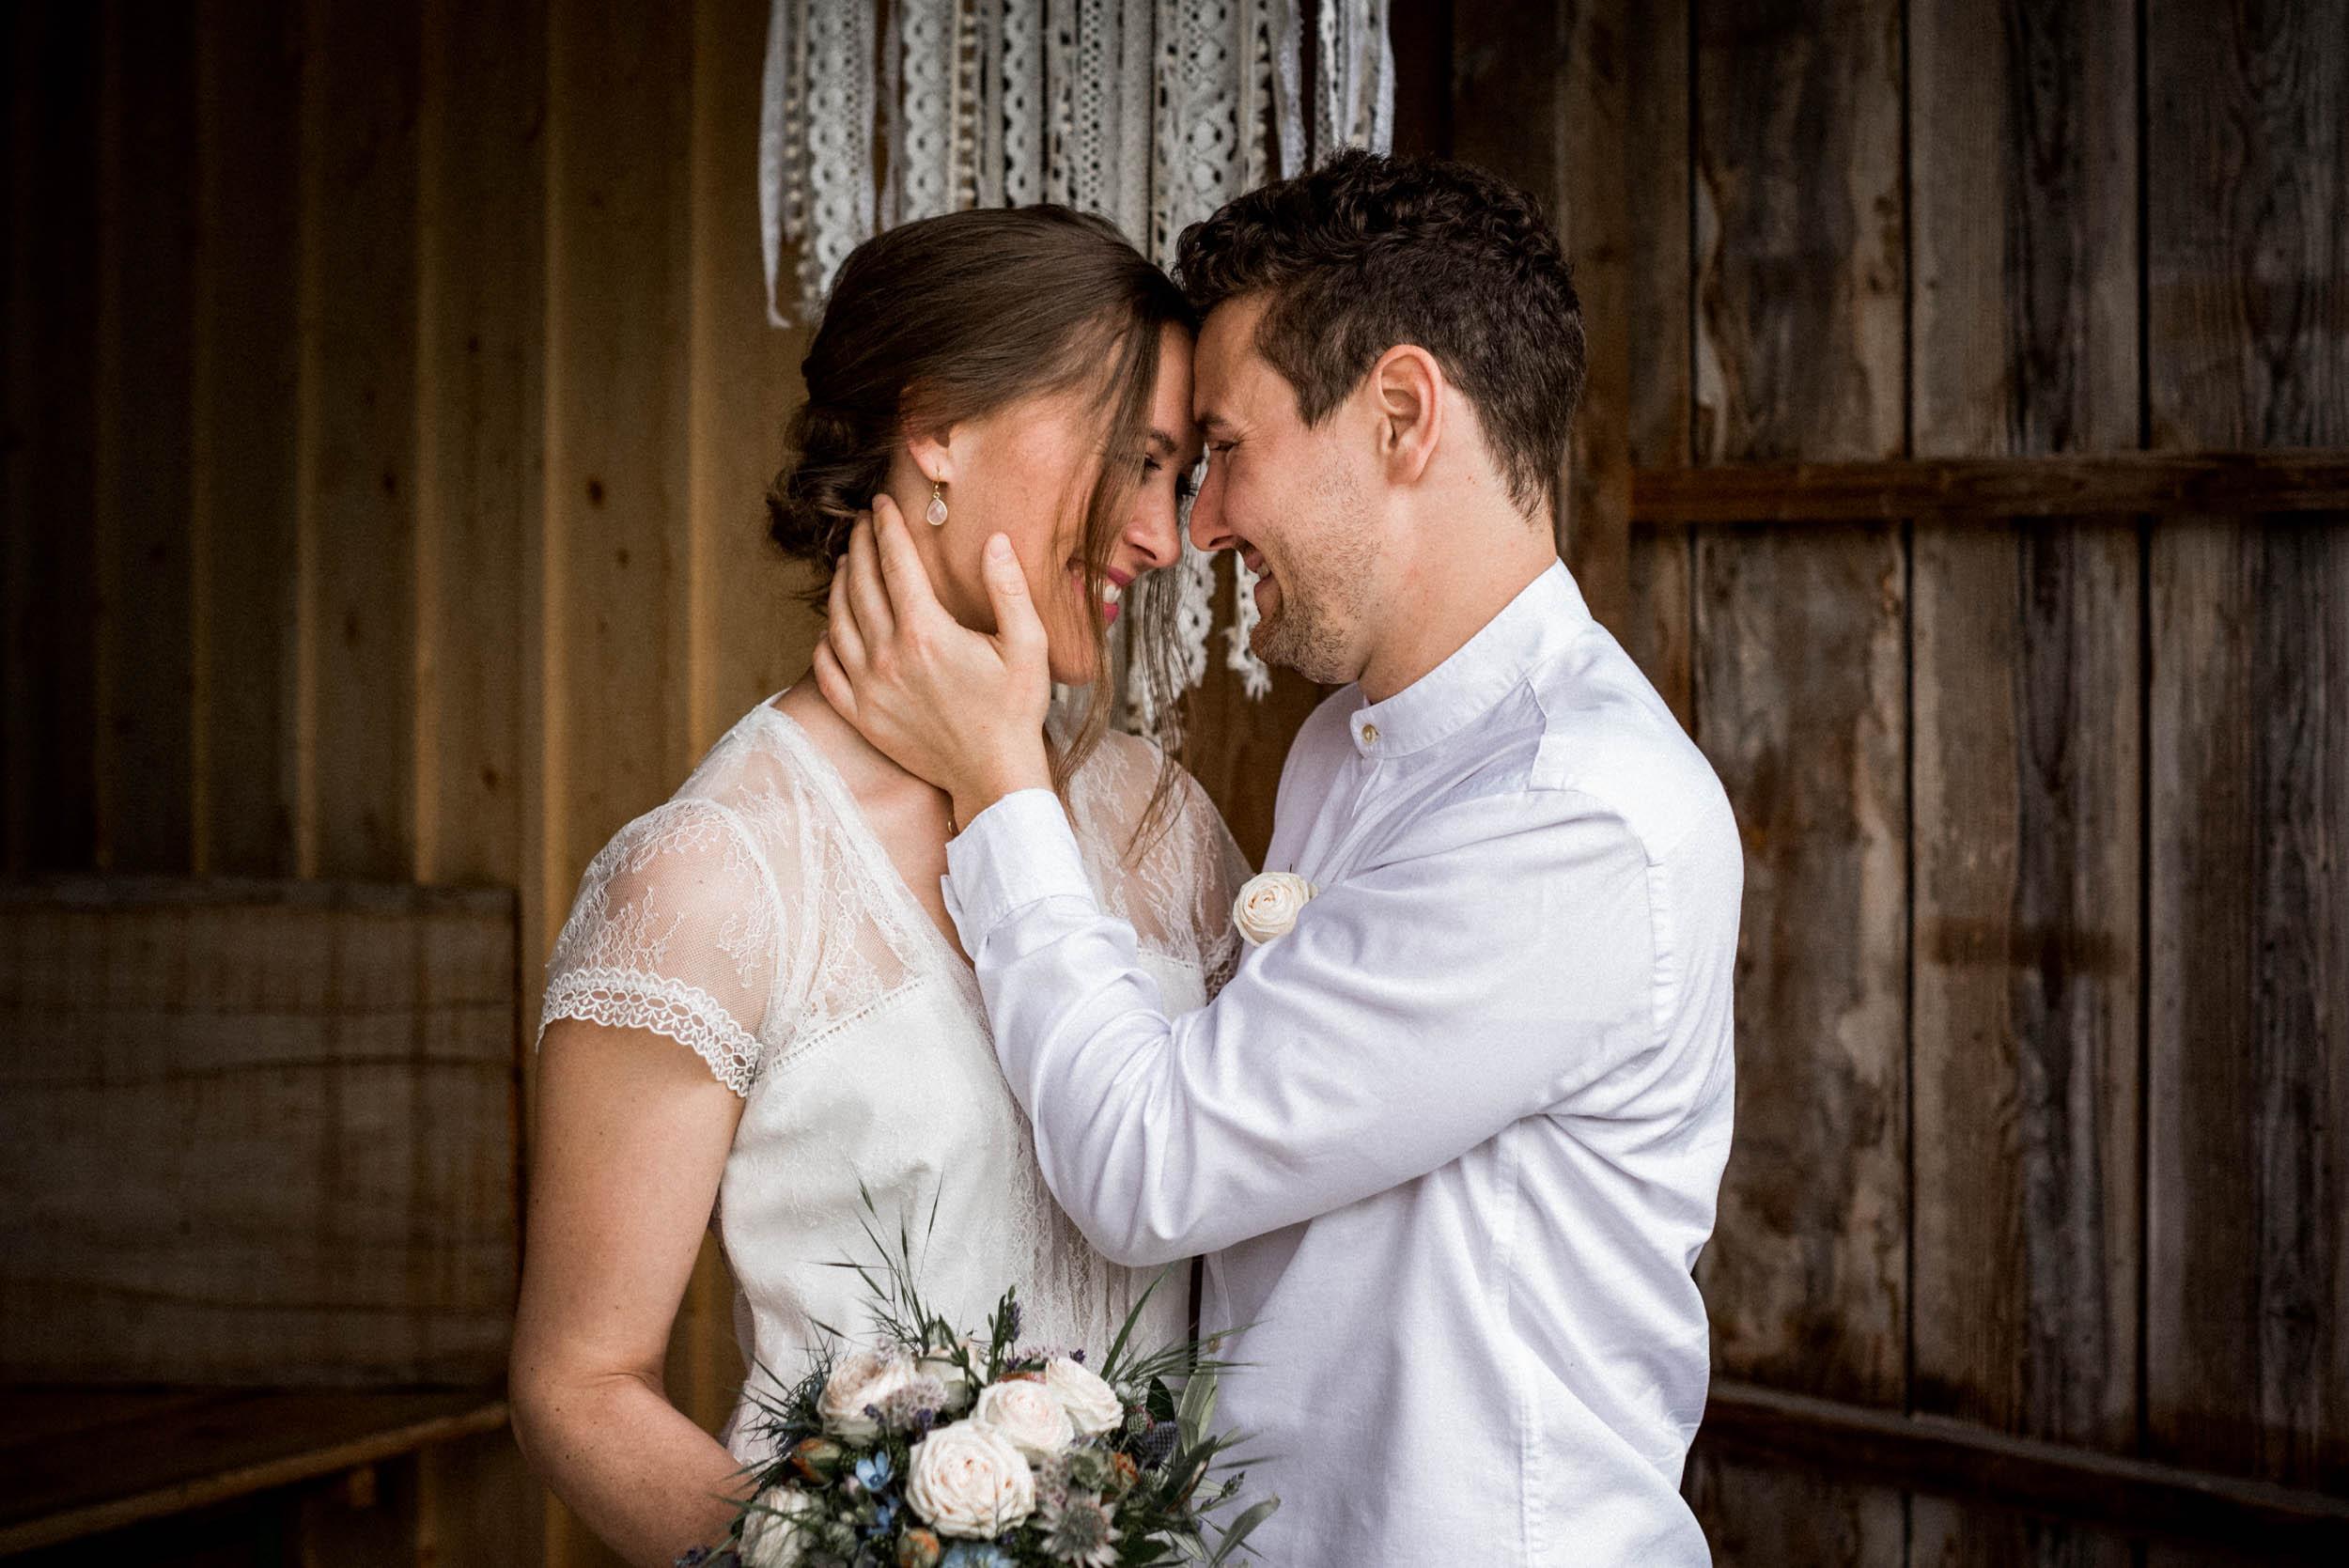 Hochzeitsreportage-Baden-Aargau_2019_2.jpg